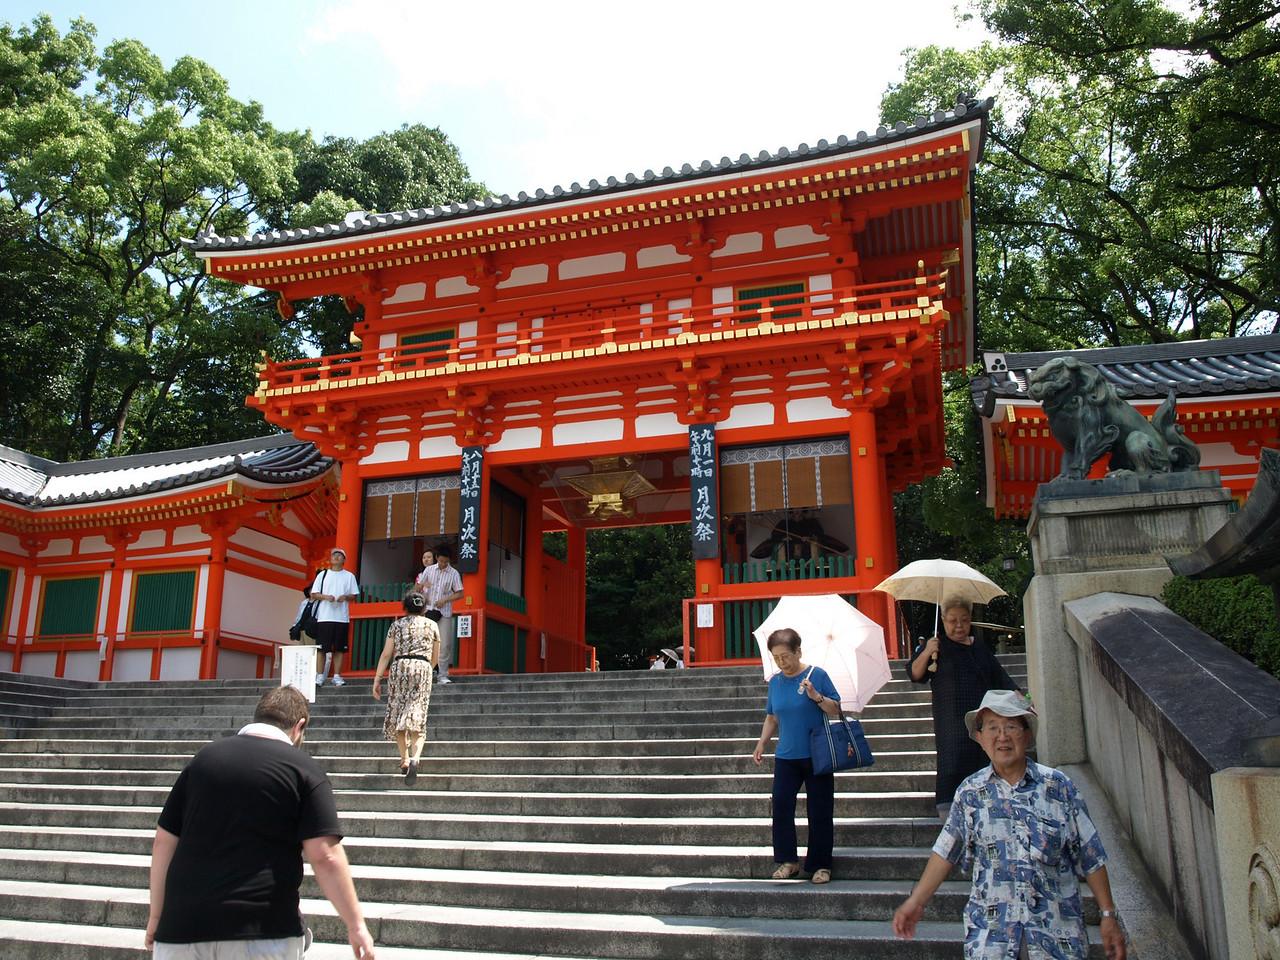 We finally reach the Yasaka Shrine